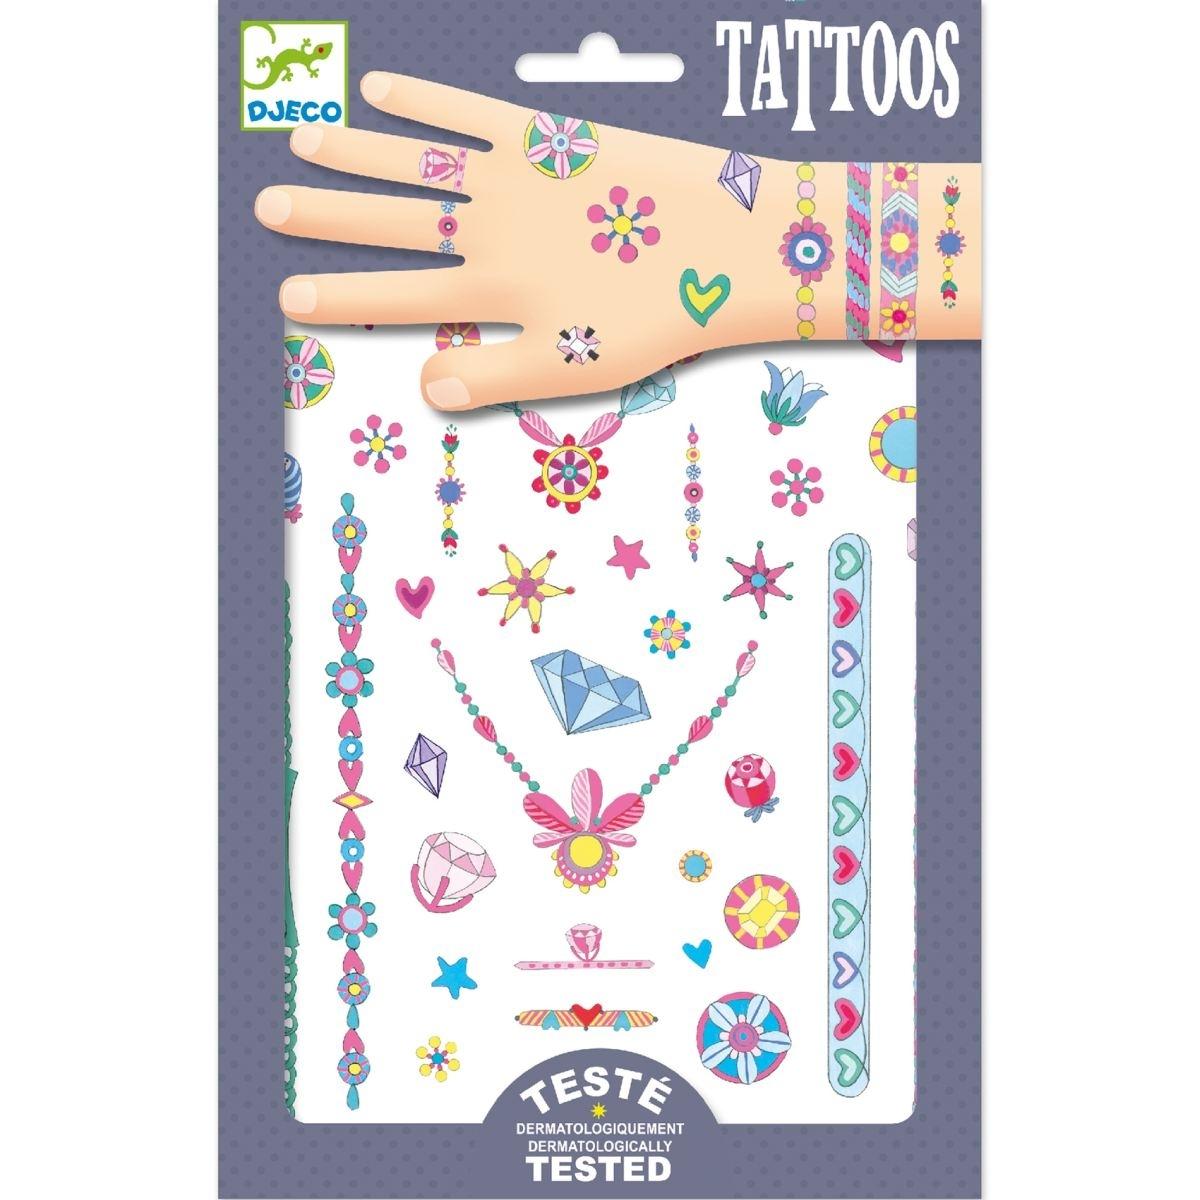 Djeco - Tattoos Jennis Schmuck